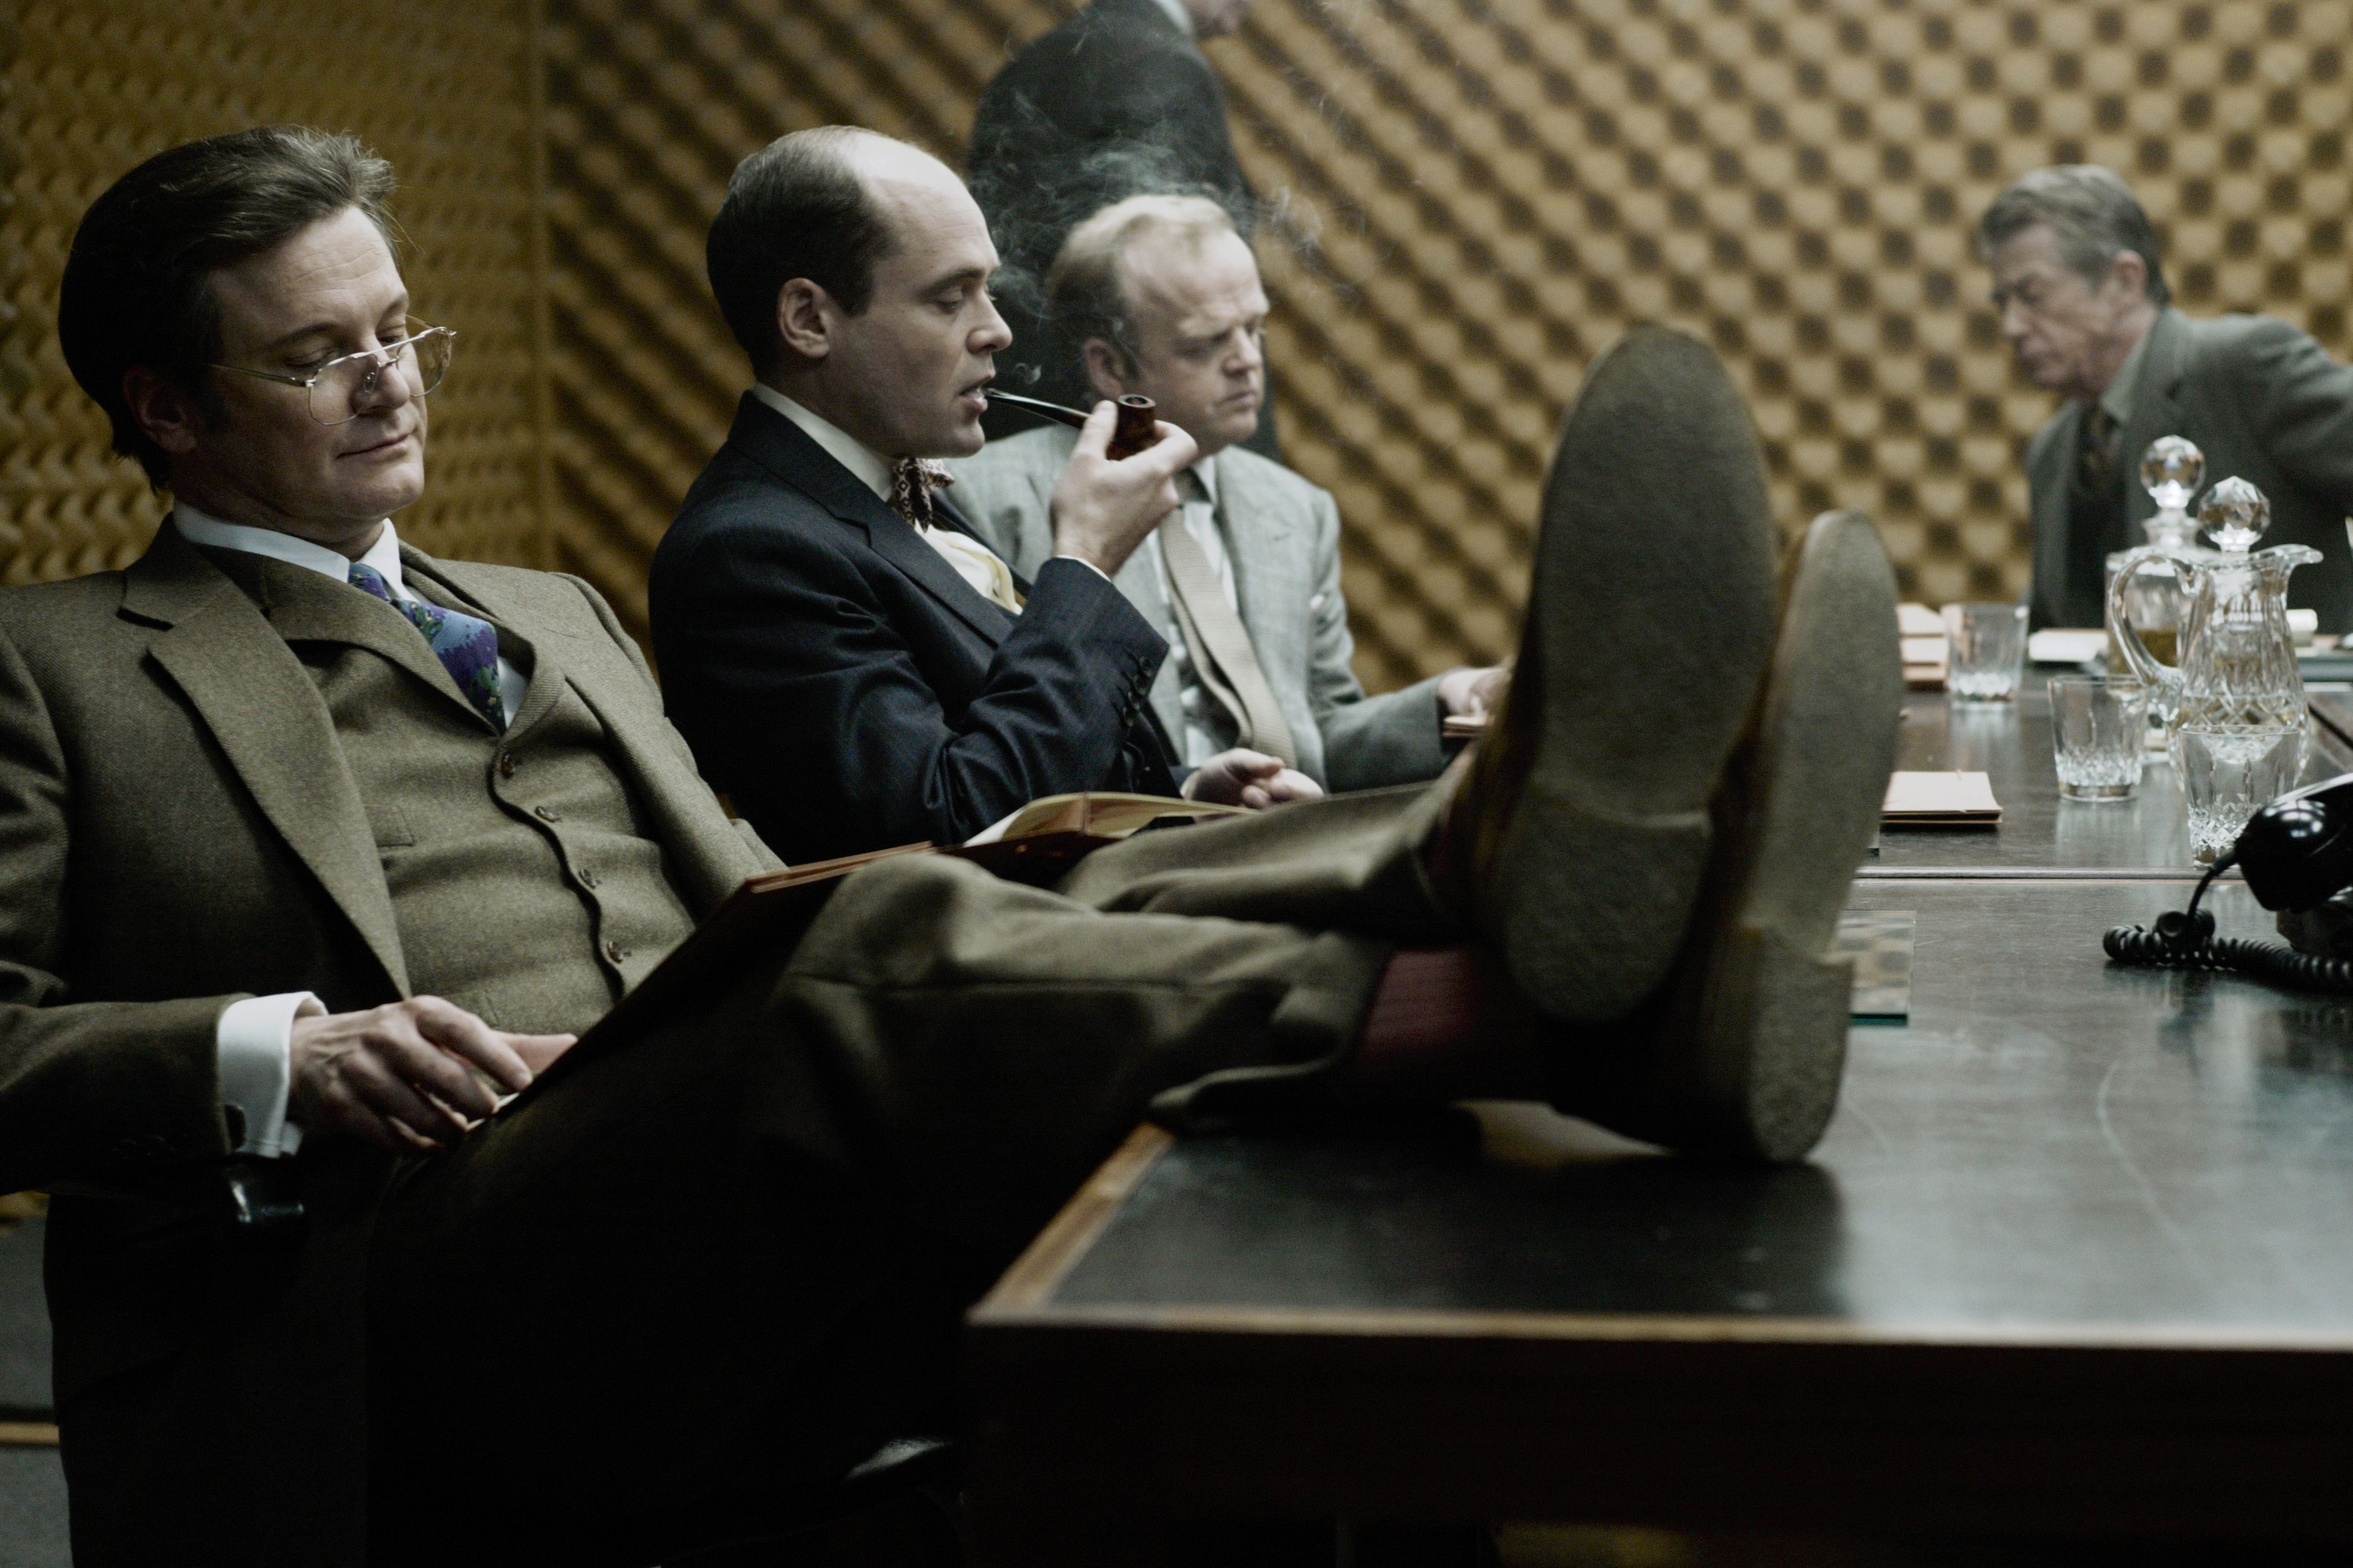 кадры из фильма Шпион, выйди вон! Колин Ферт, Давид Денсик, Тоби Джонс, Джон Херт,